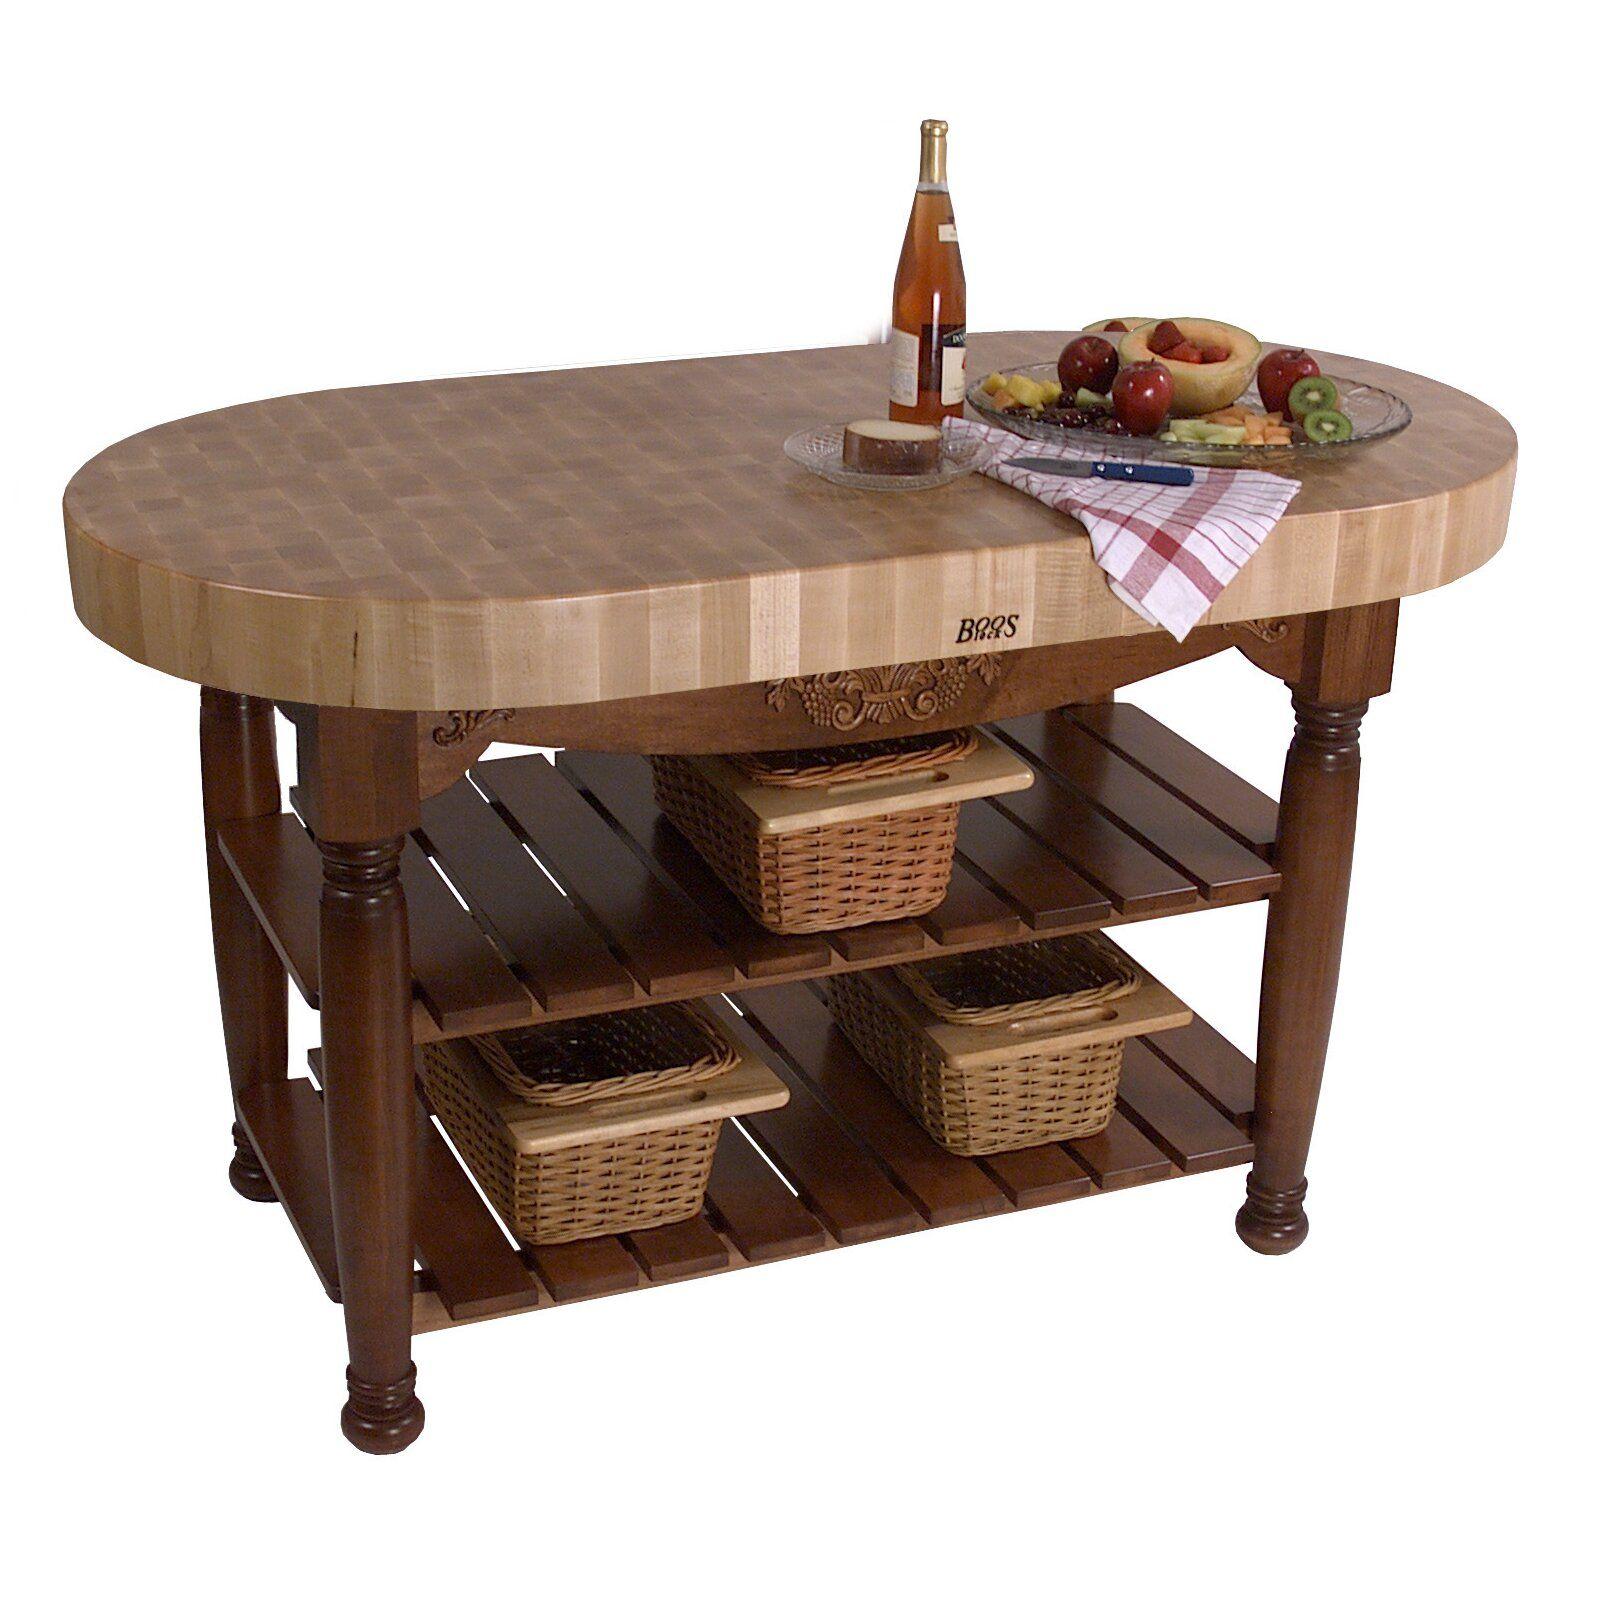 American Heritage Furniture Restoration: American Heritage Prep Table With Butcher Block Top